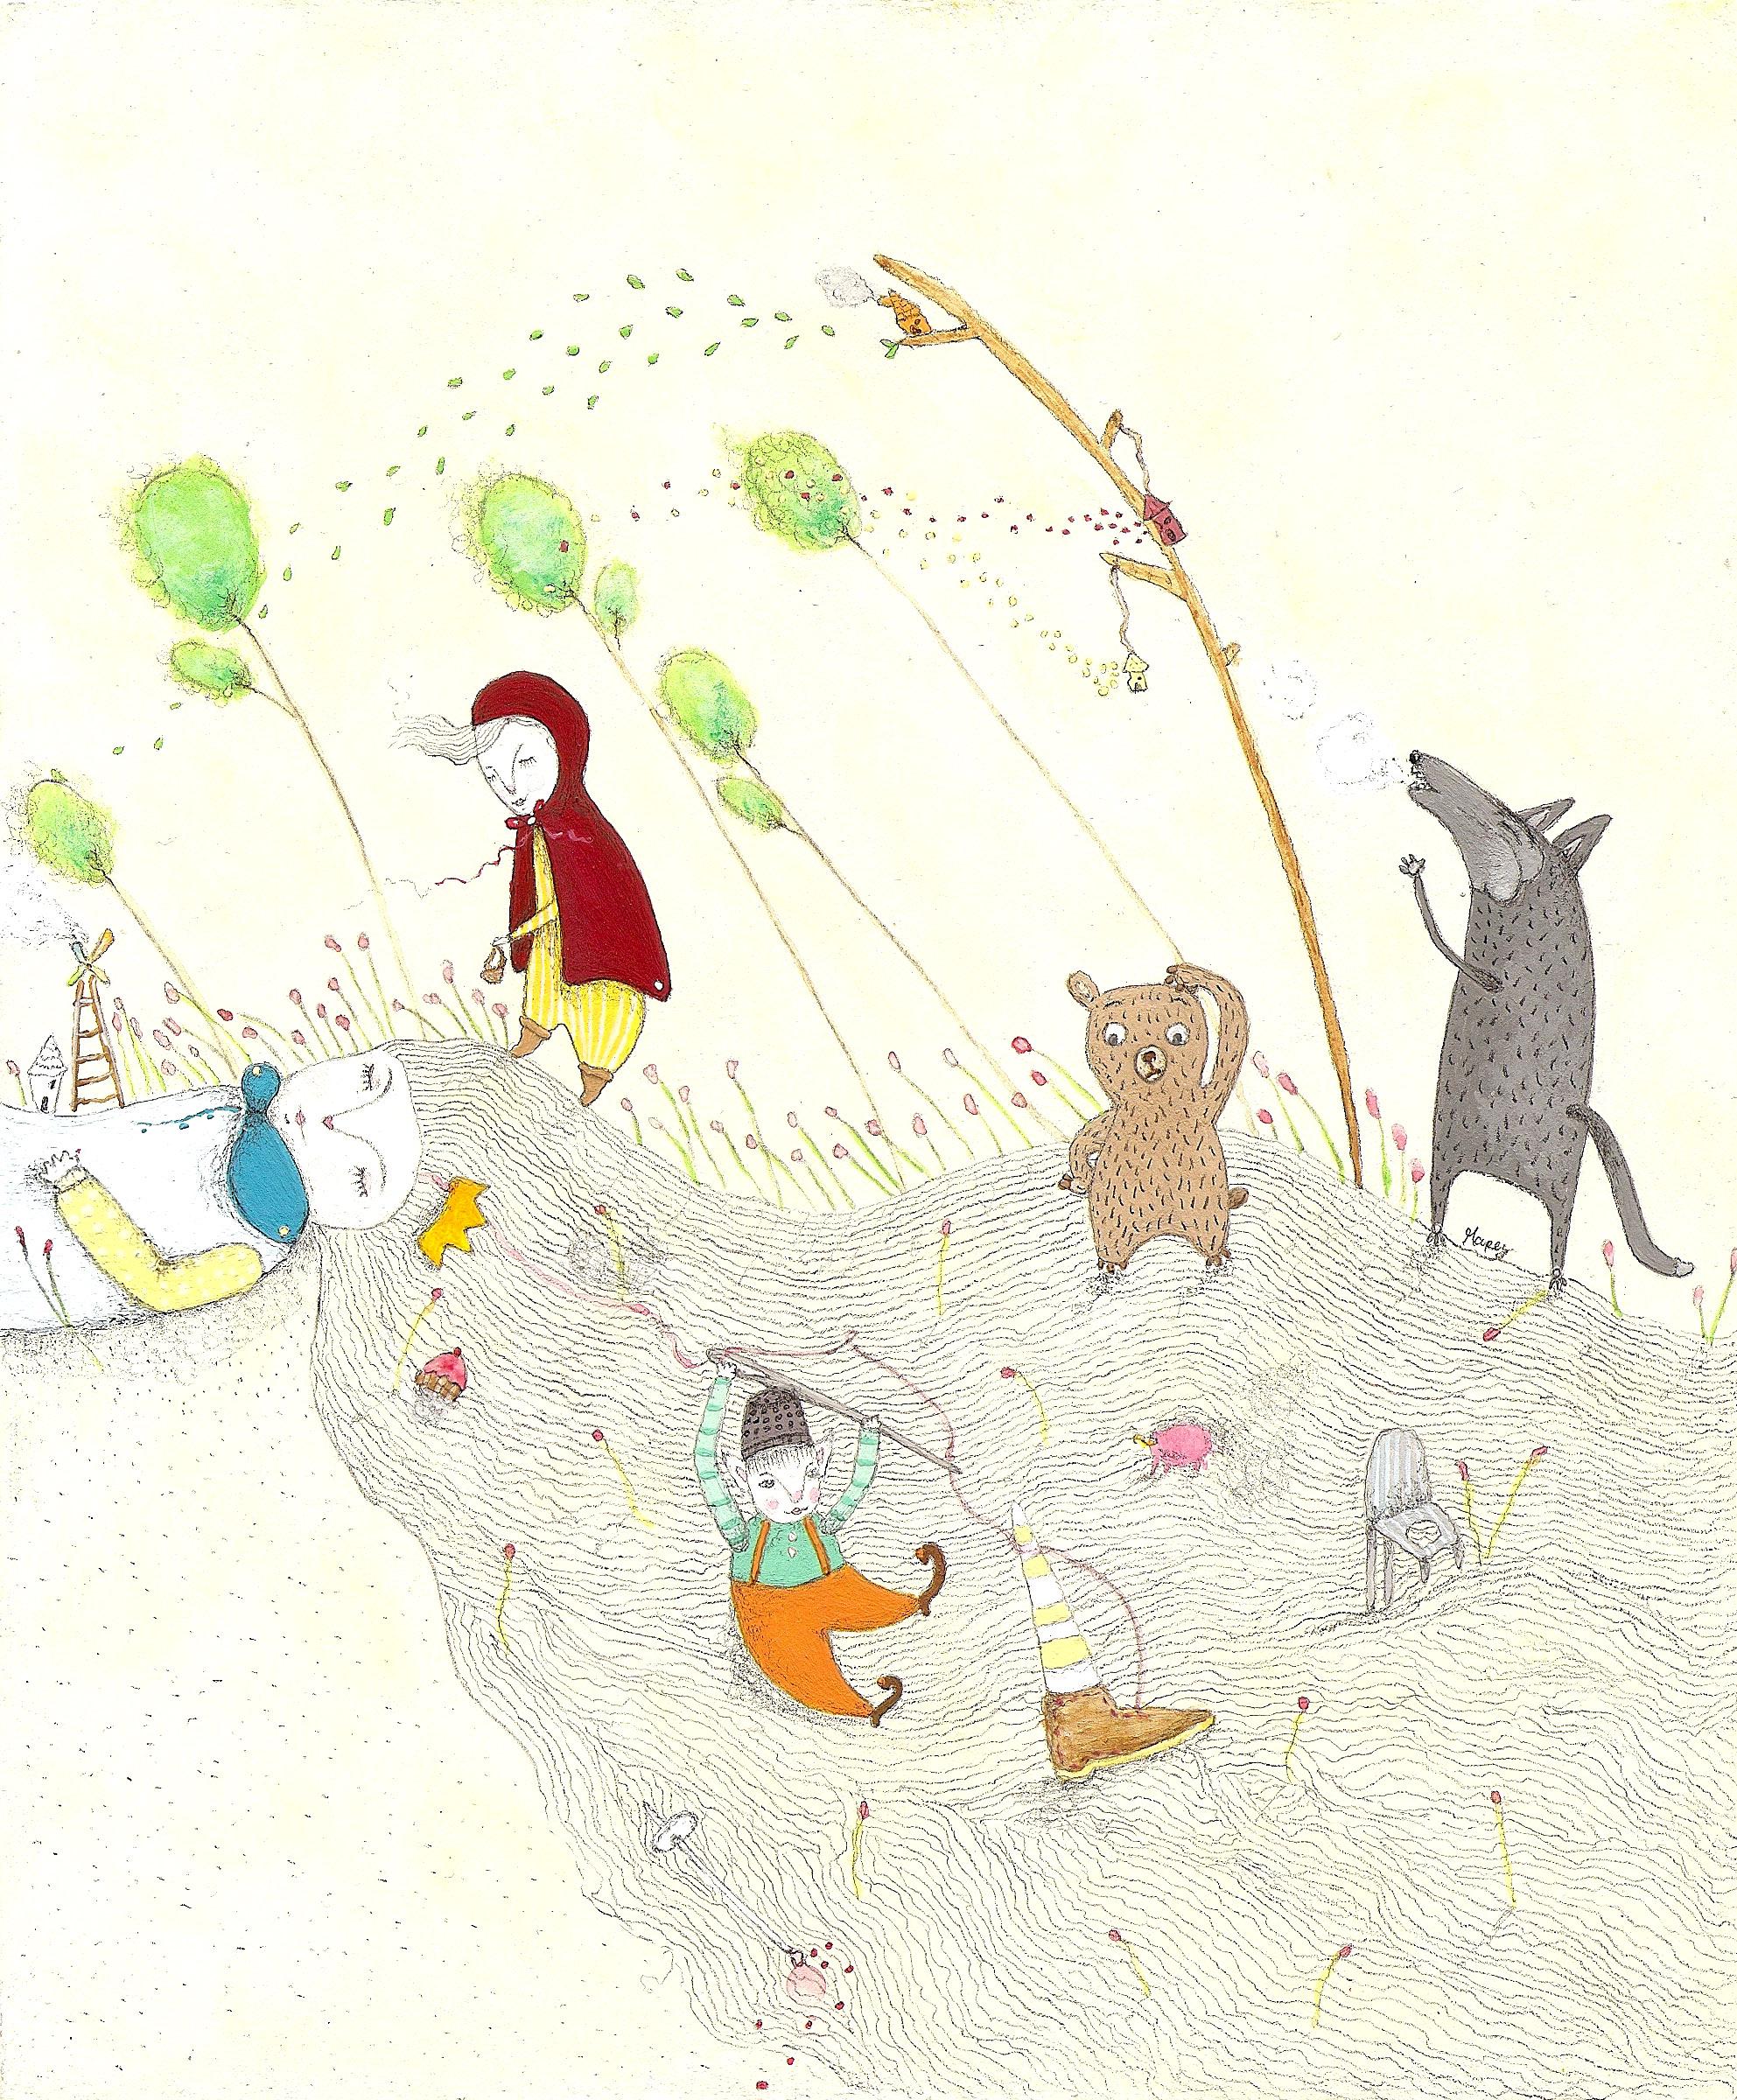 Prueba ilustracion Villegas Editores, Marcela López.jpg